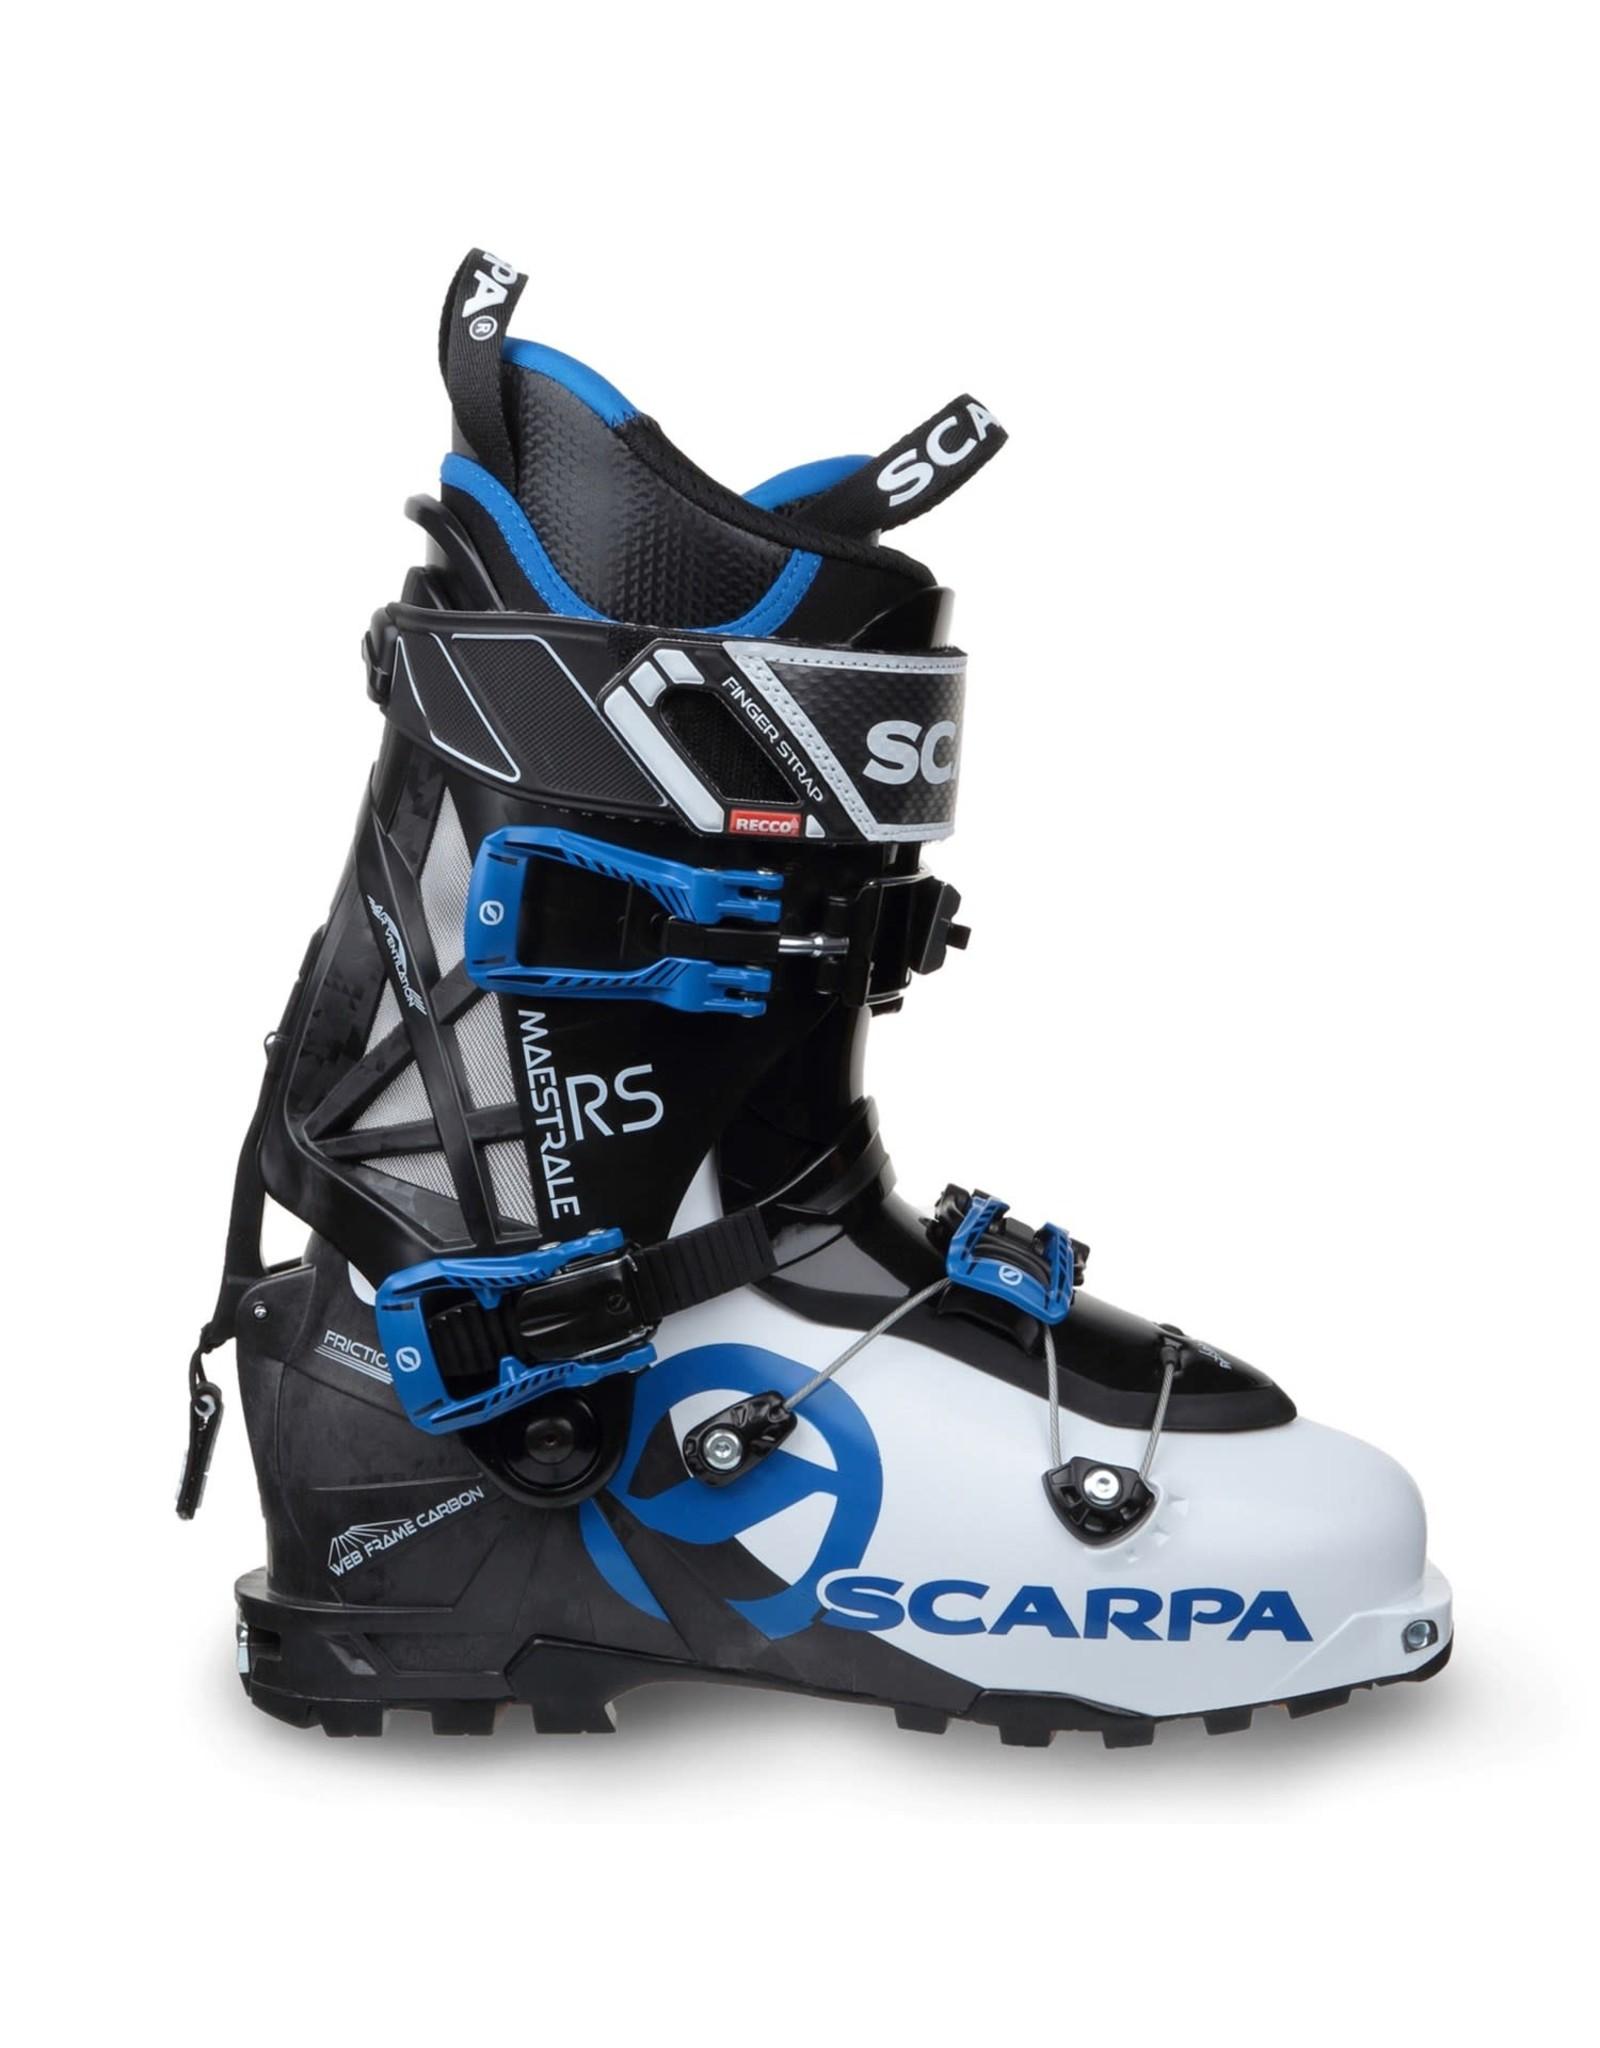 Scarpa Scarpa Maestrale RS Boot - Men